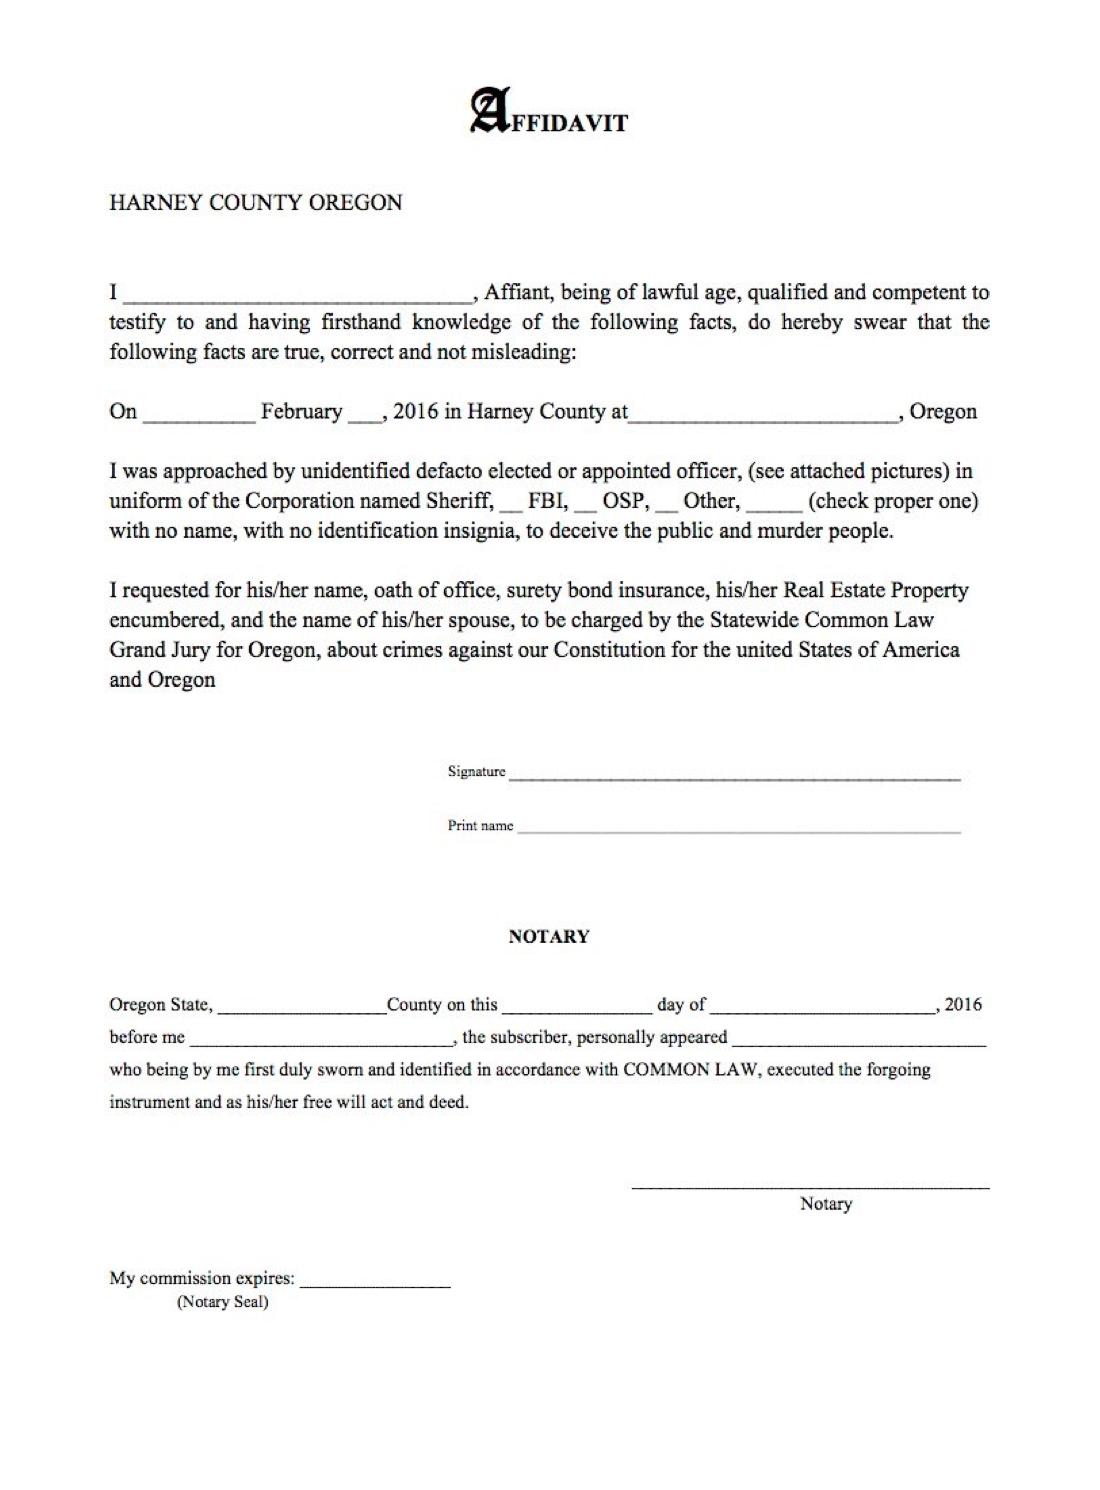 Statewide Common Law Grand Jury, Oregon/Florida/Nebraska